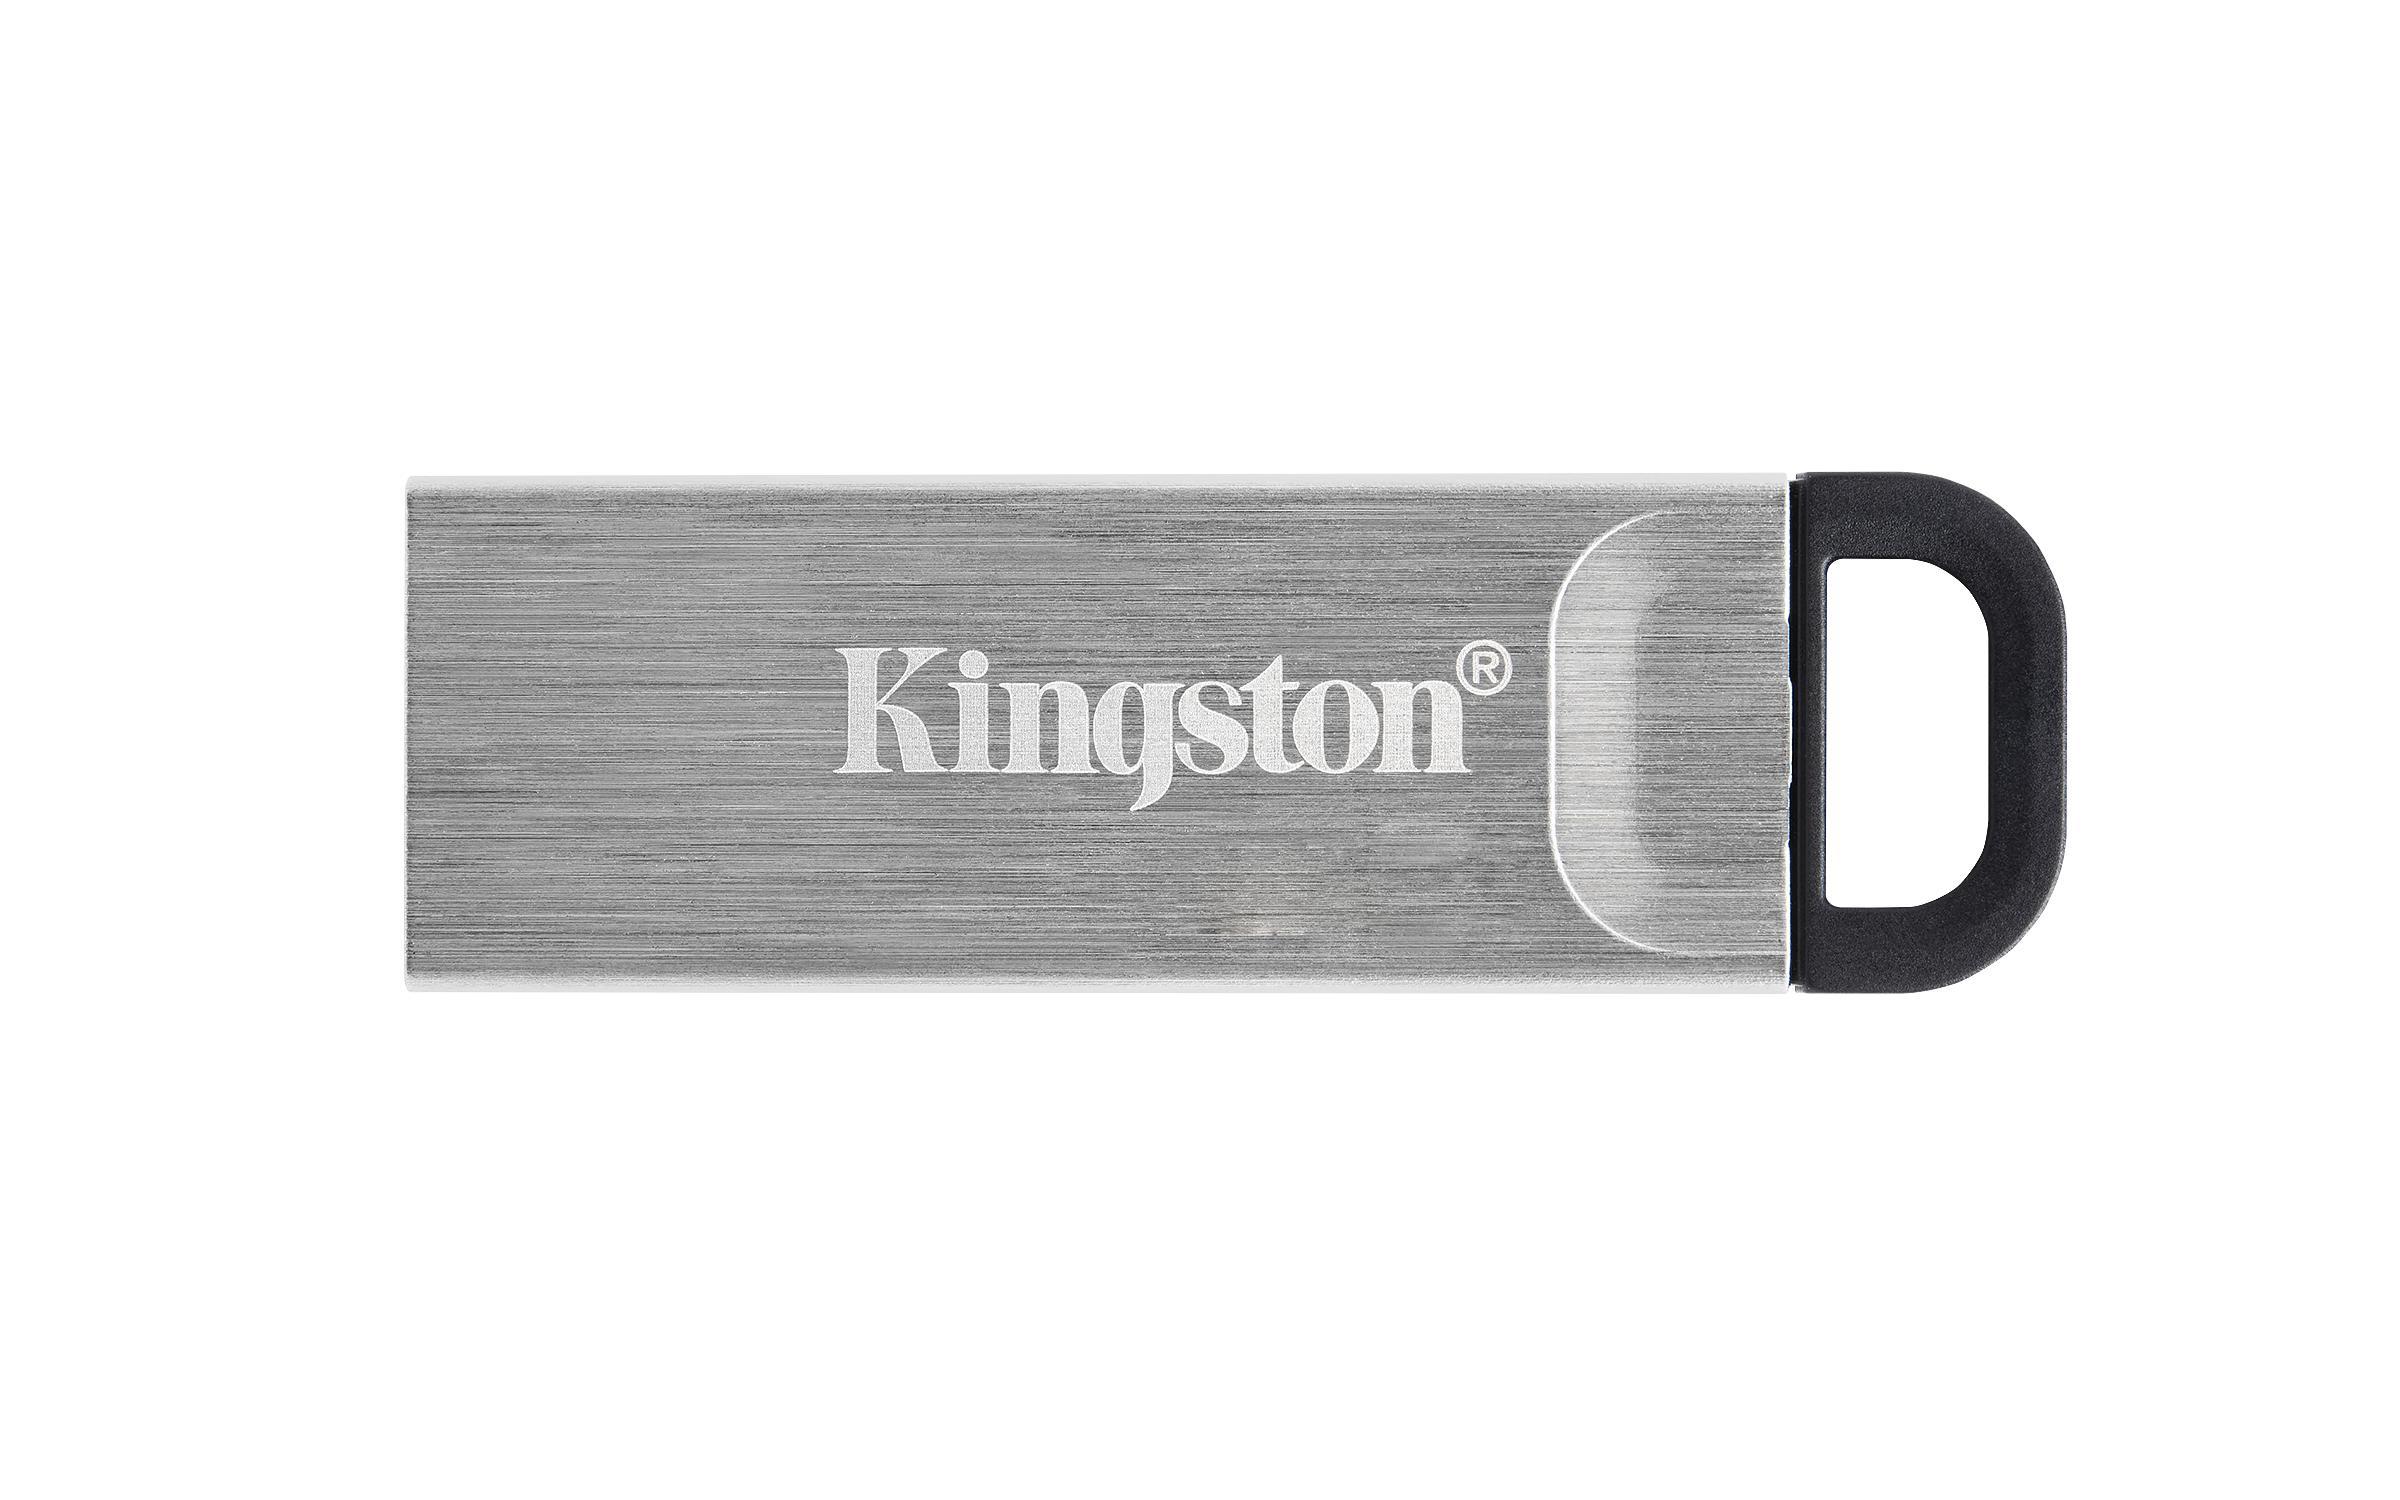 USB памет KINGSTON DataTraveler Kyson 128GB, USB 3.2 Gen 1, Сребрист